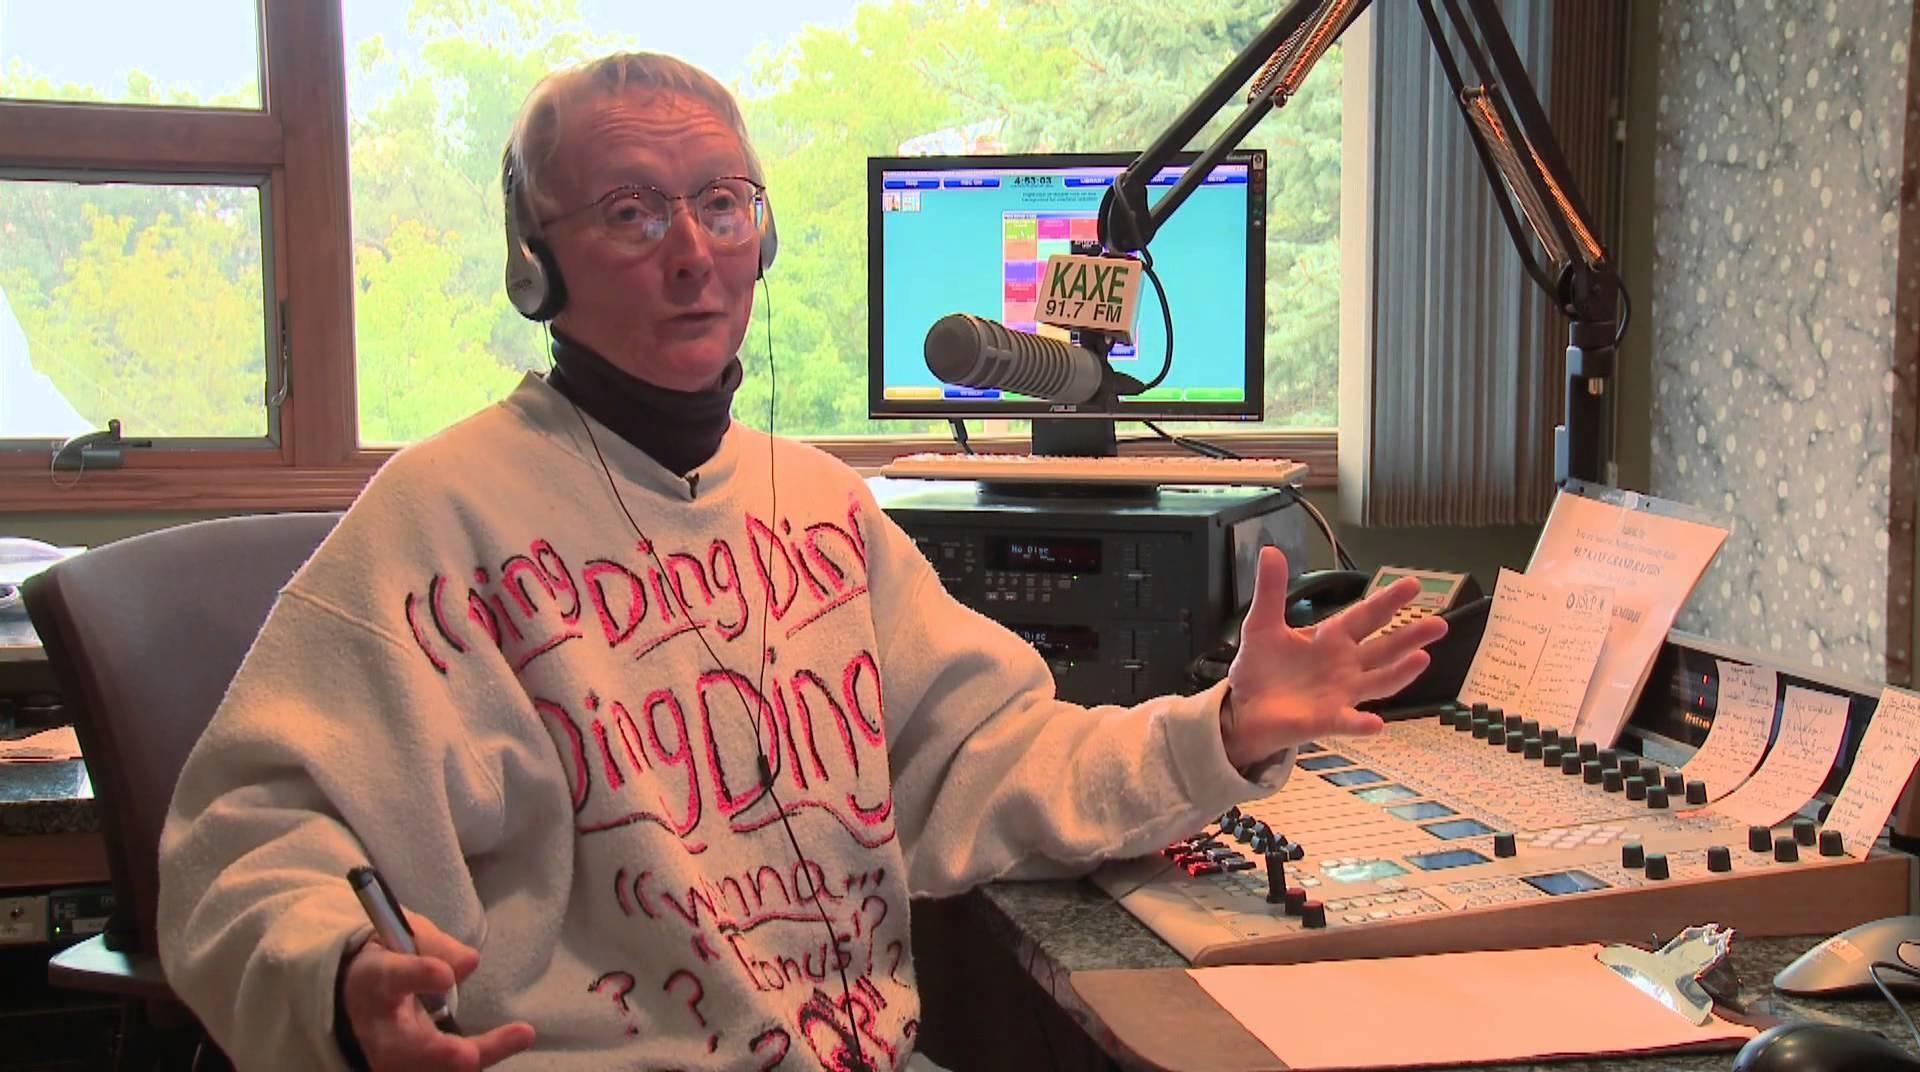 Northern Community Radio KAXE/KBXE